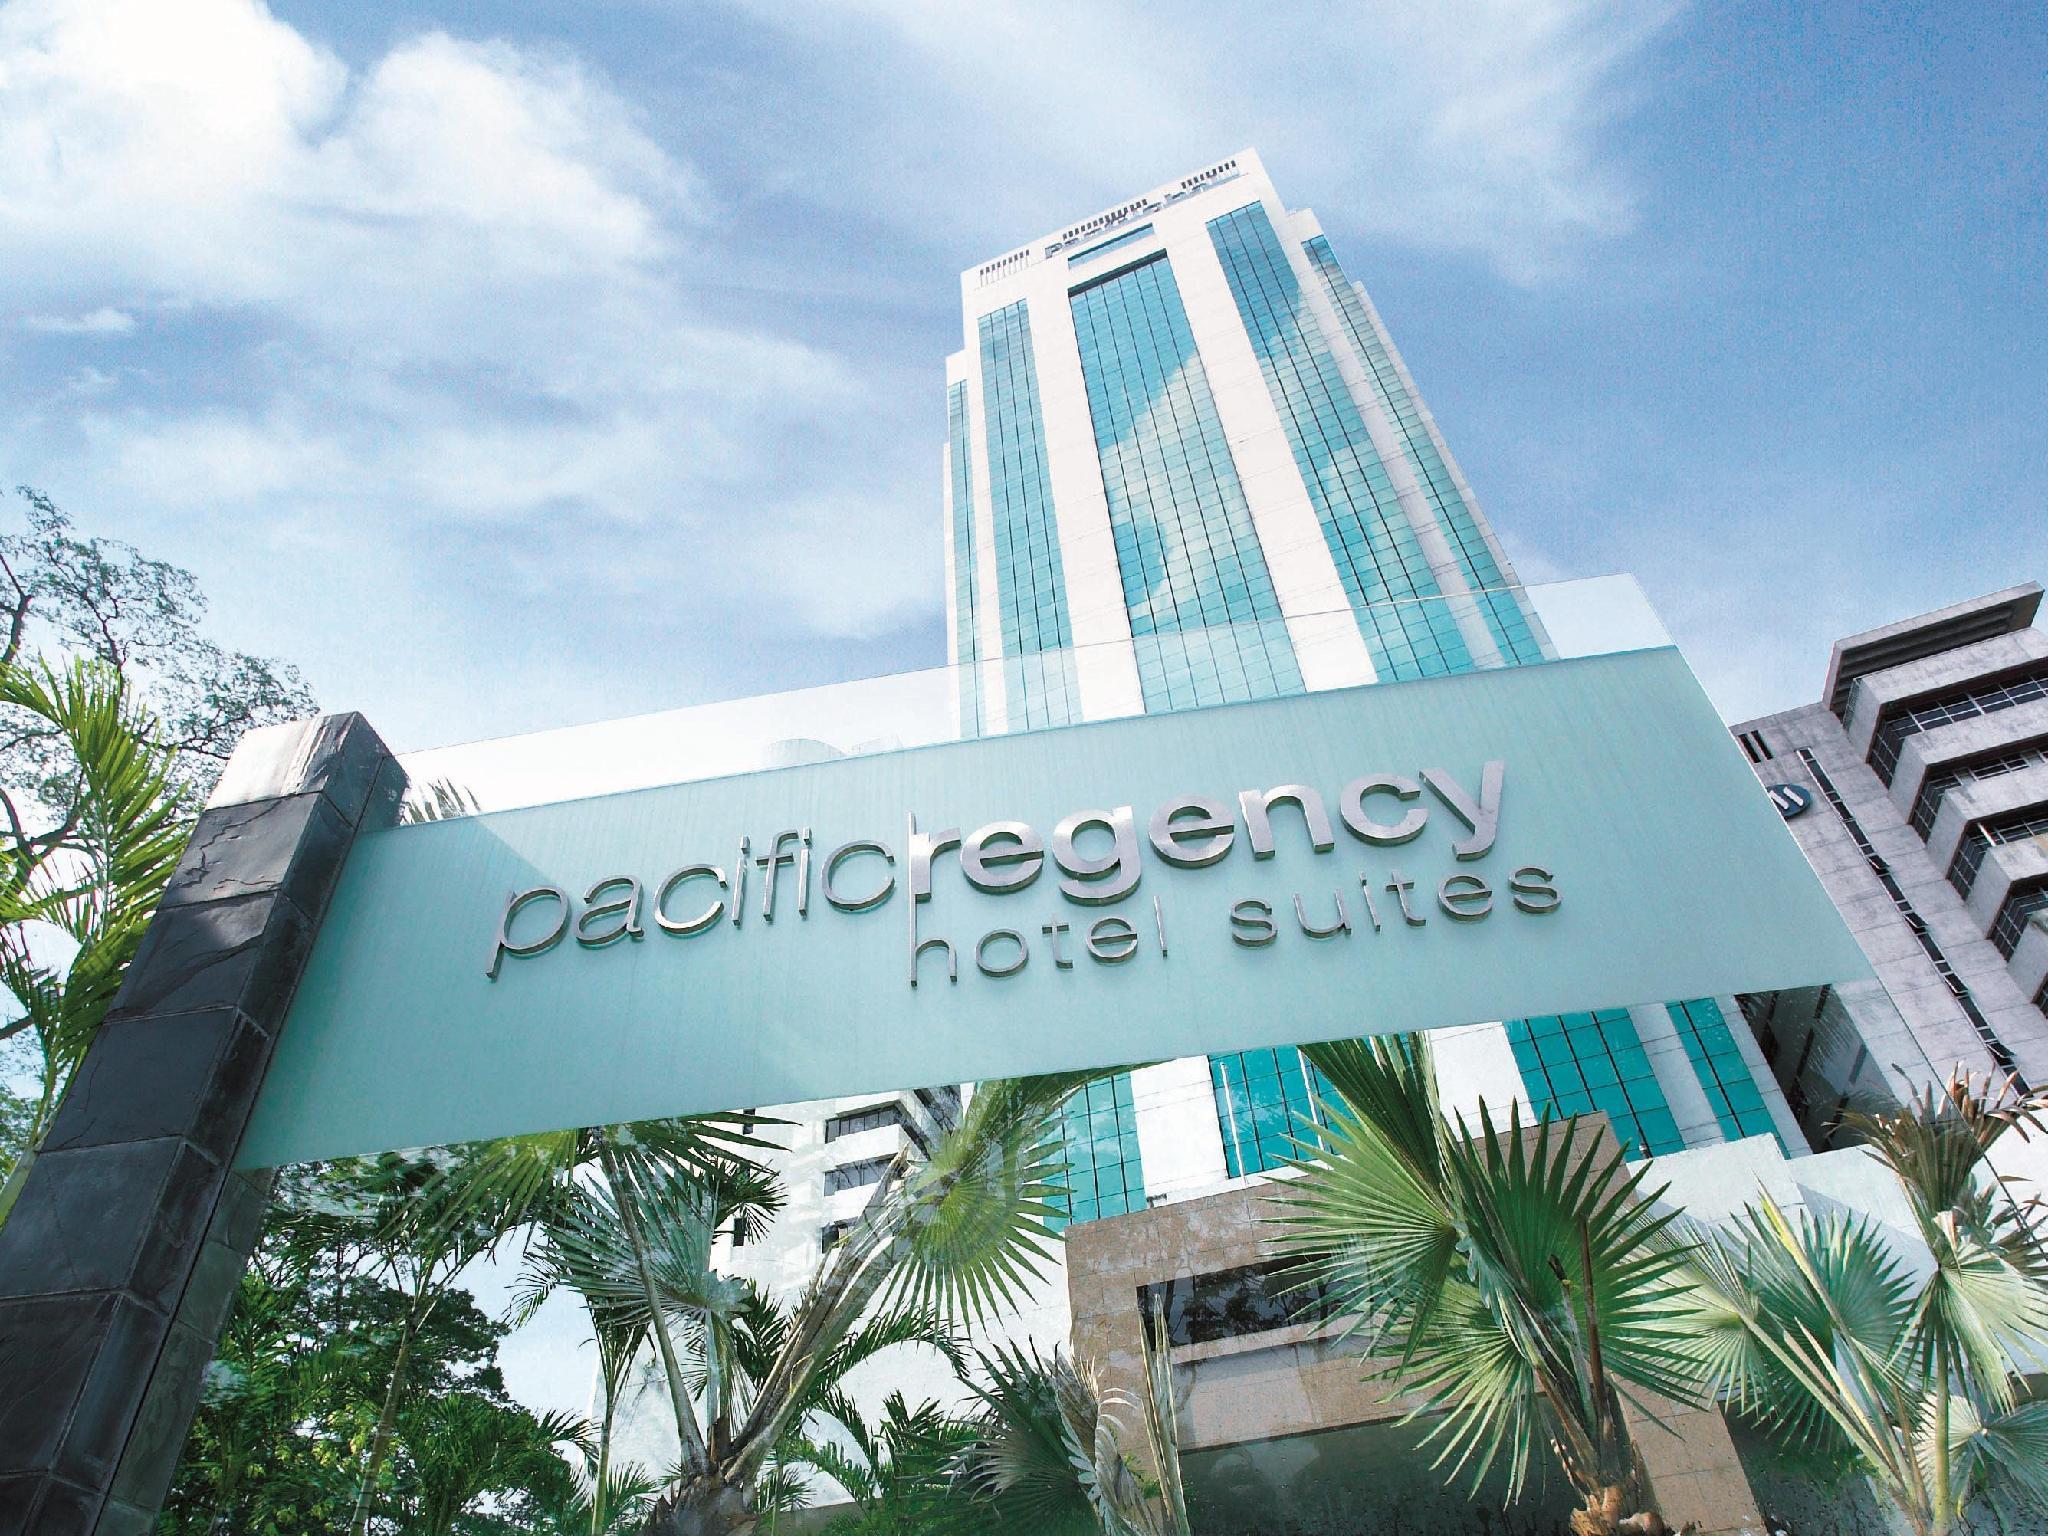 Pacific Regency